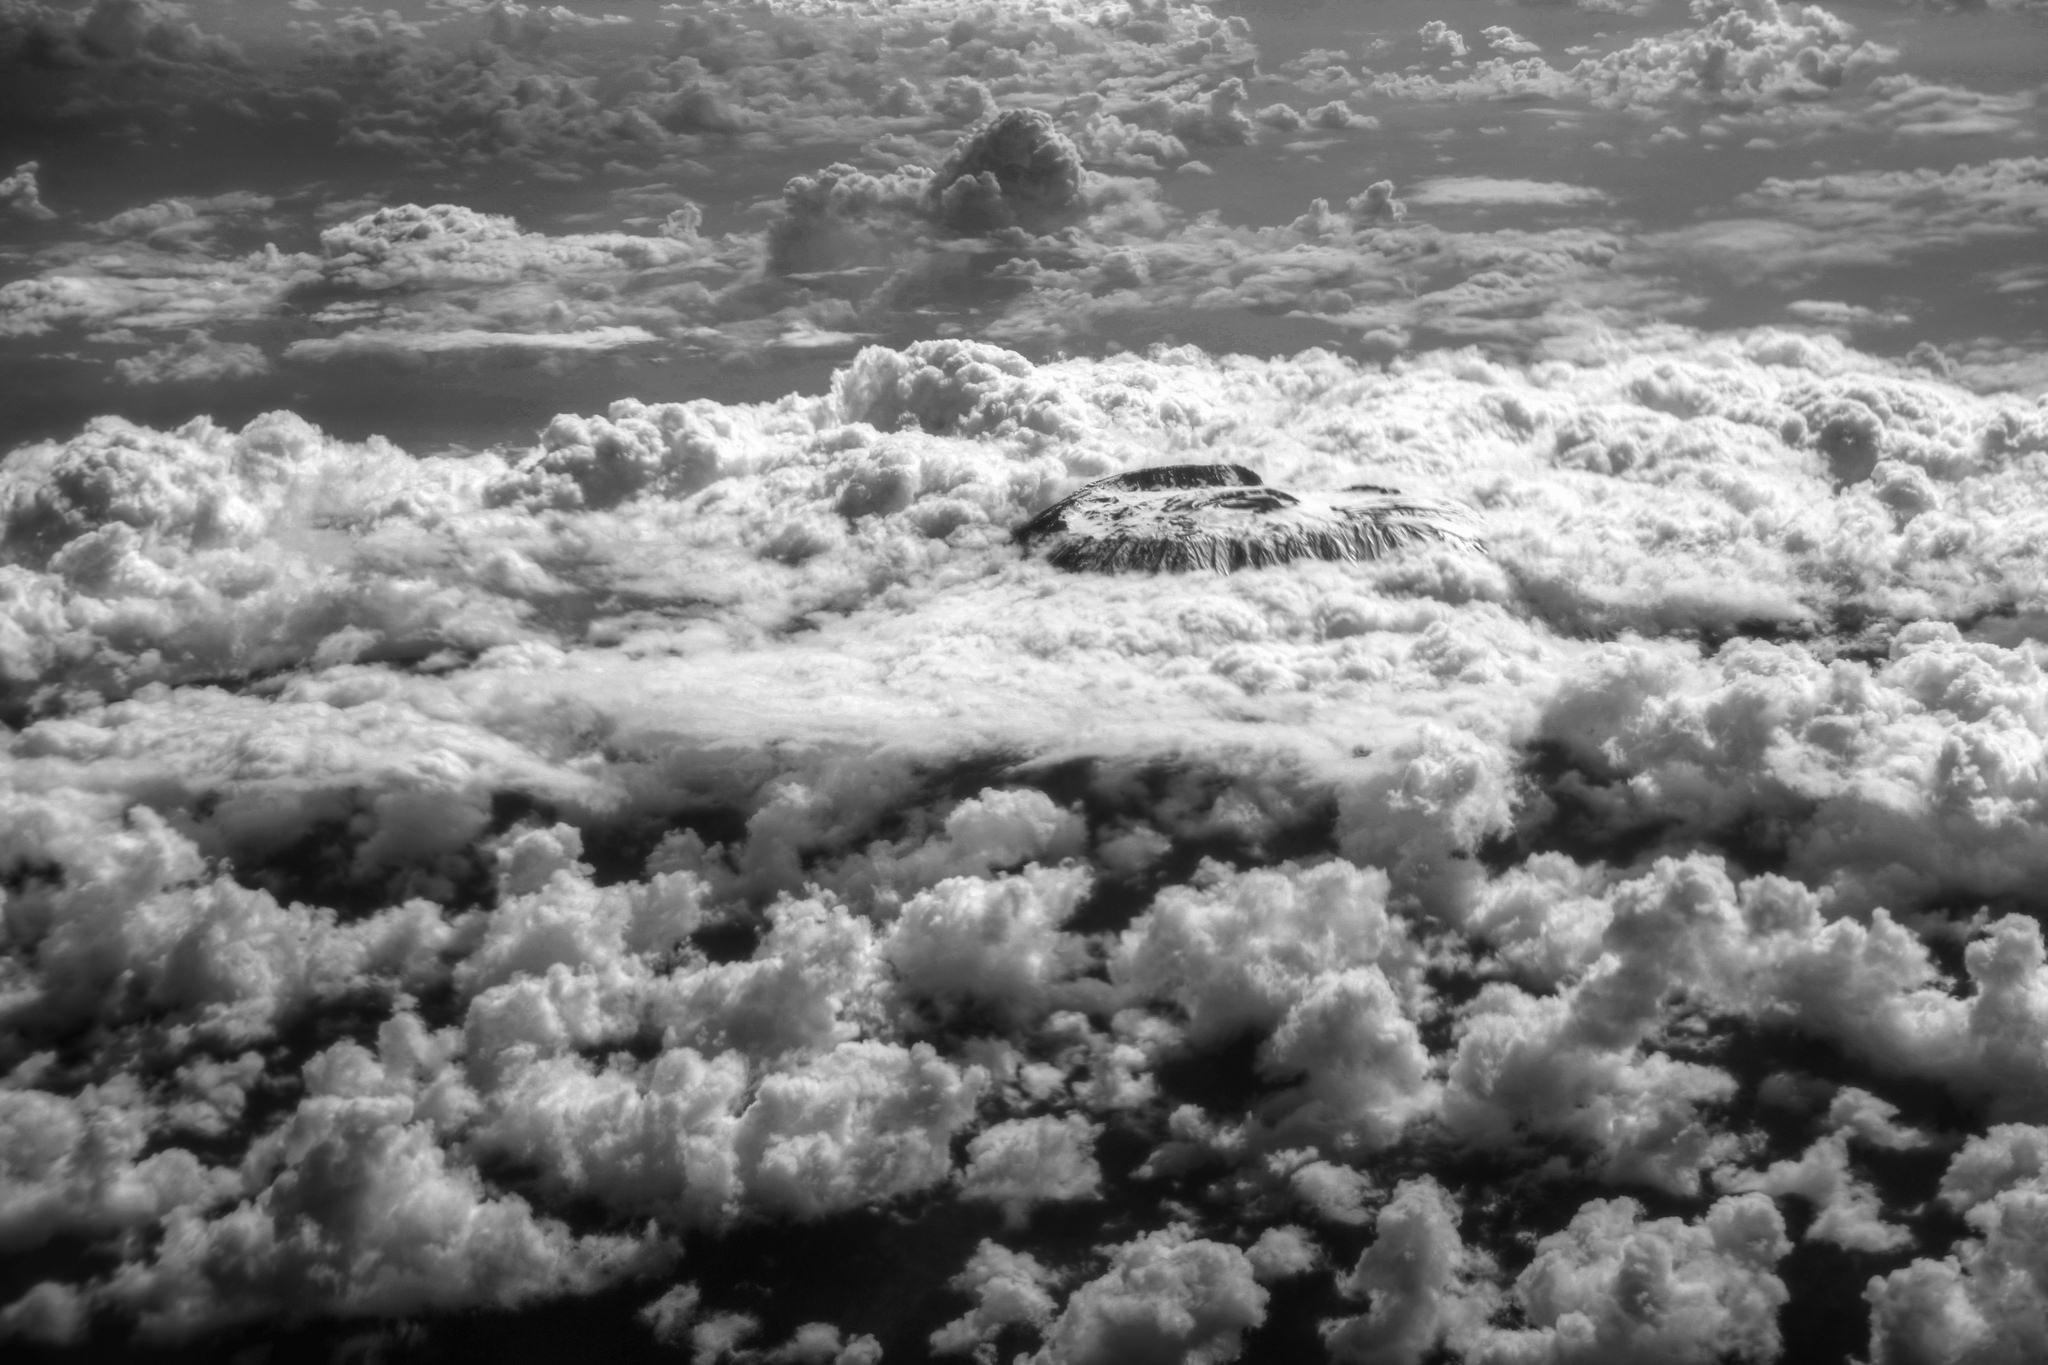 Kilimanjaro and Clouds   (2014). Photograph by Mariusz Kluzniak .